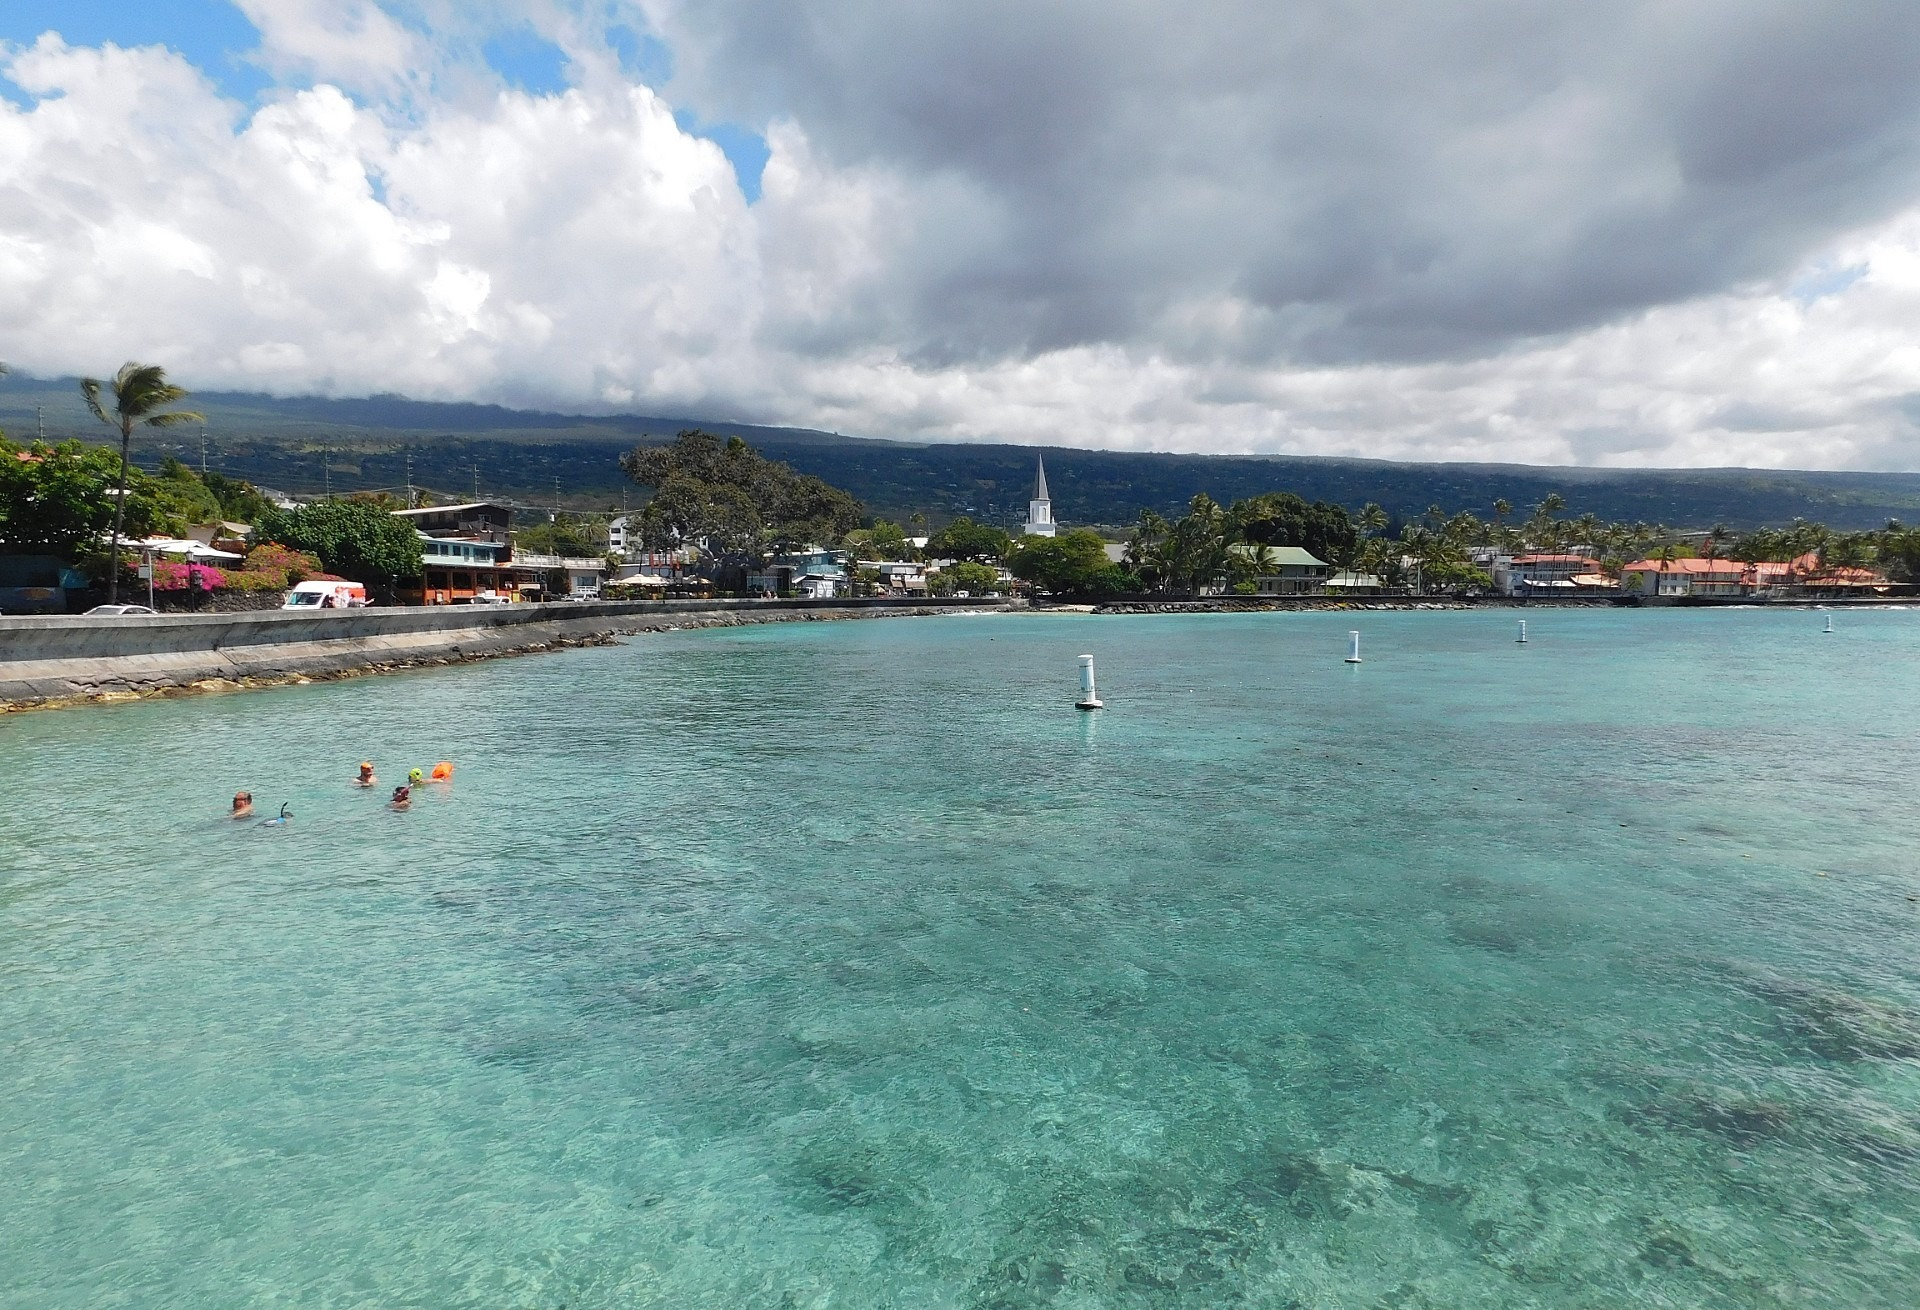 Beautiful Kailua Bay in Kailua-Kona on Hawaii